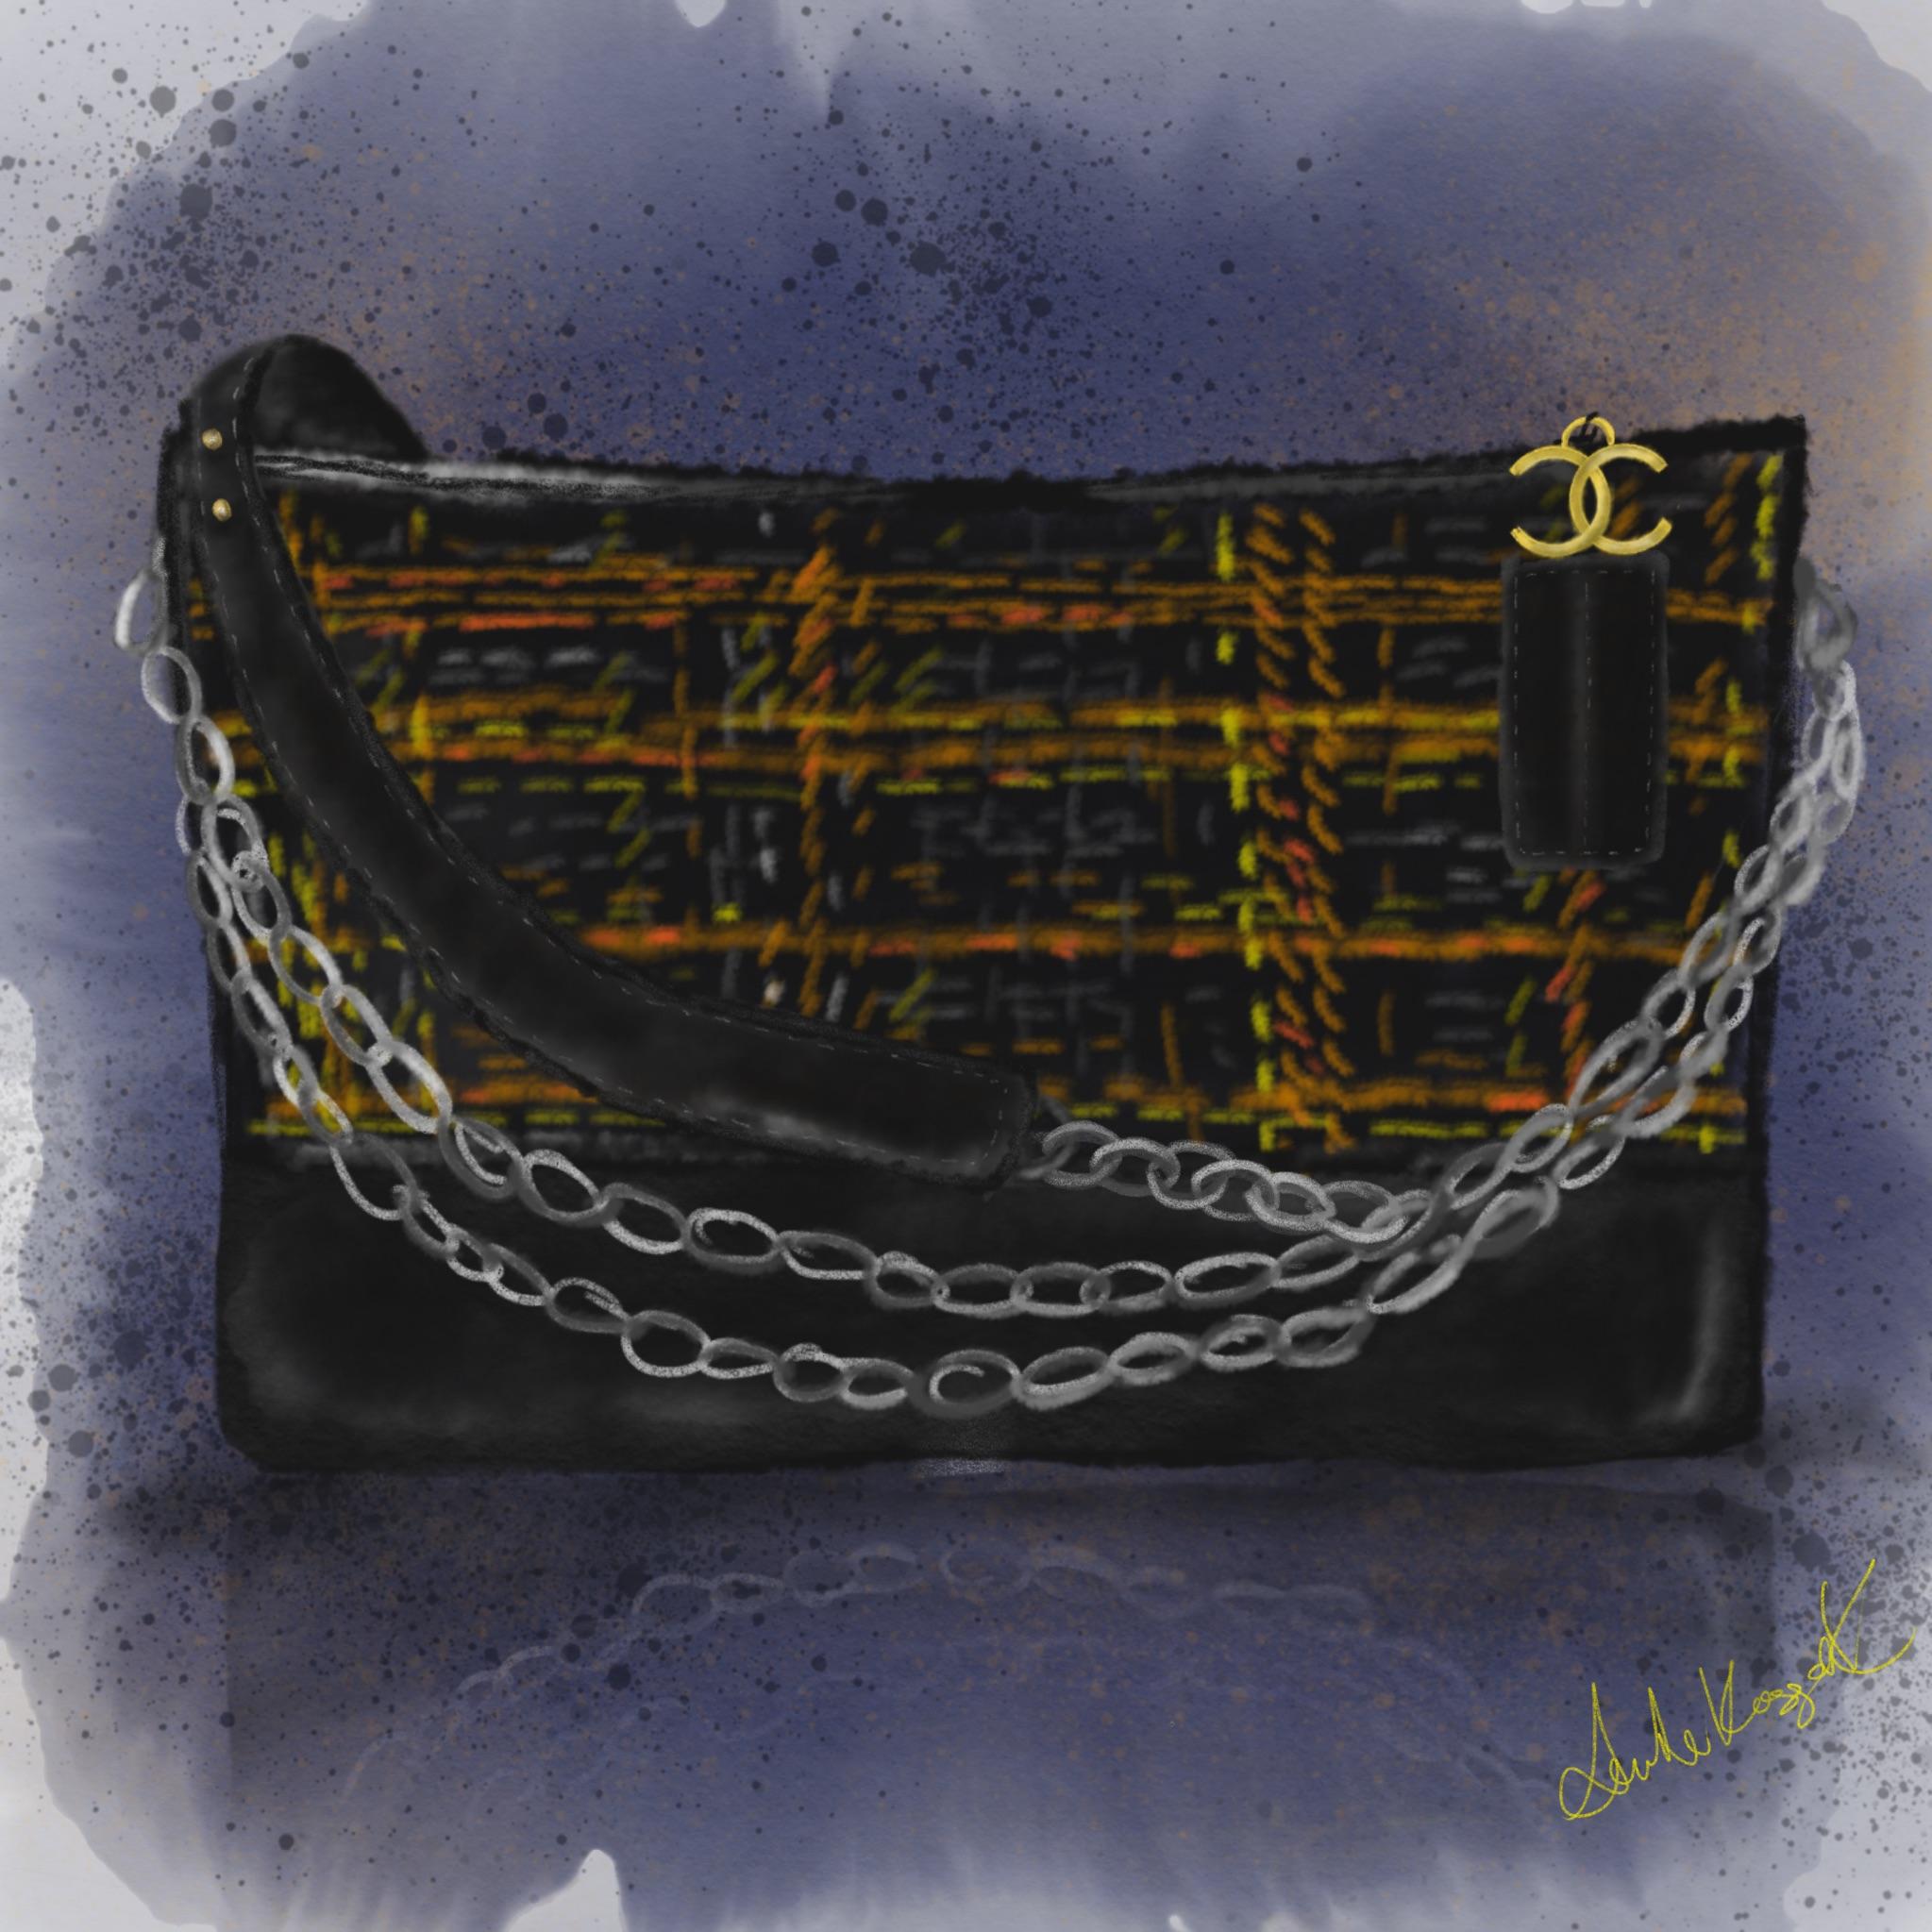 Chanel handbag 2017